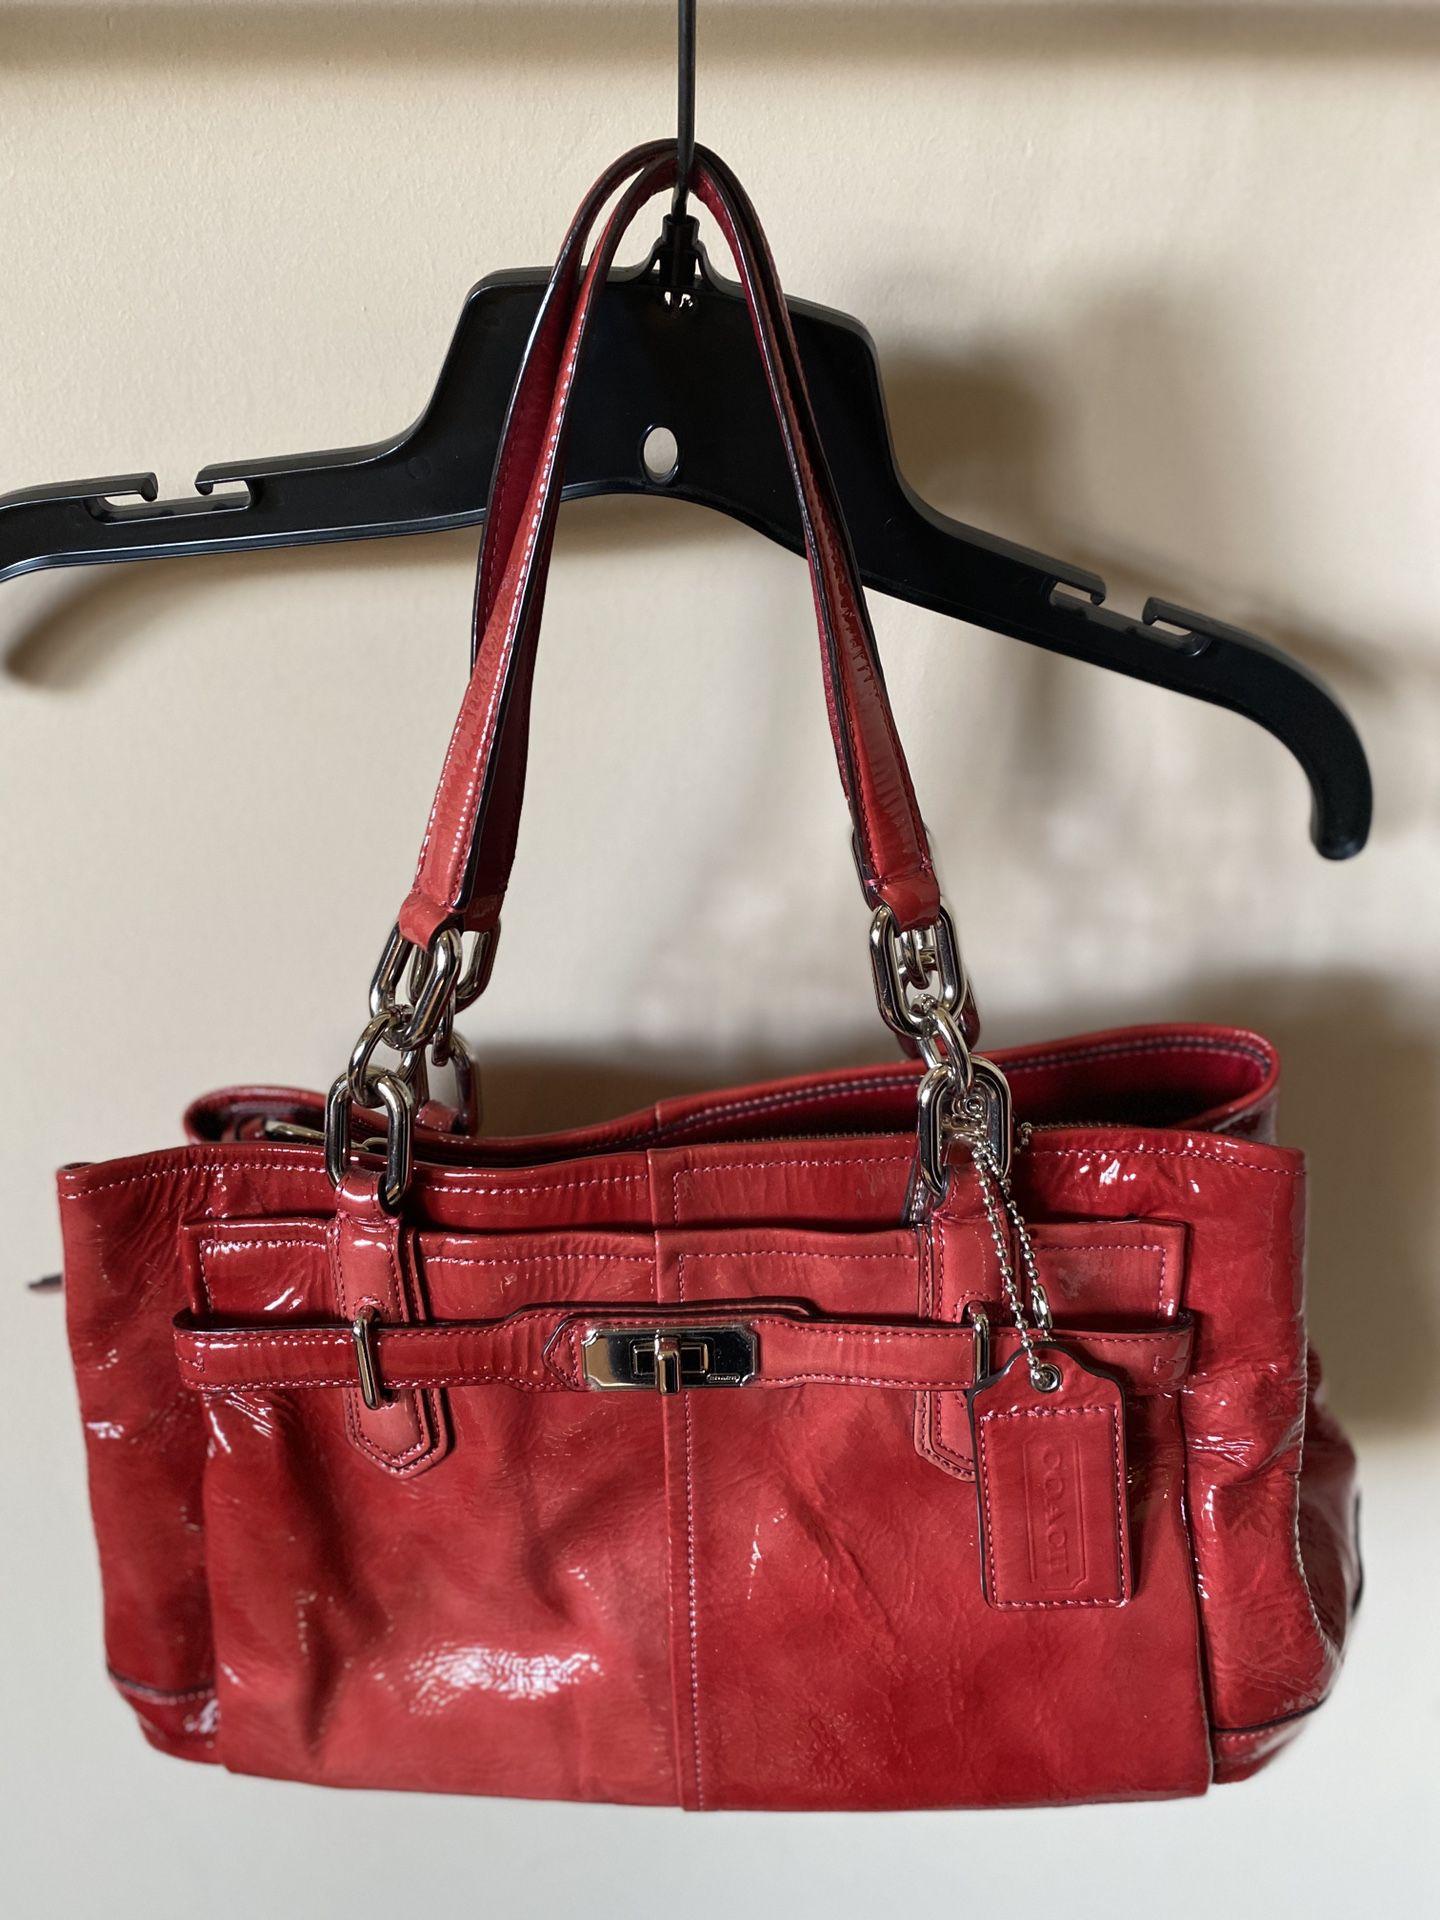 Coach Red Purse Handbag